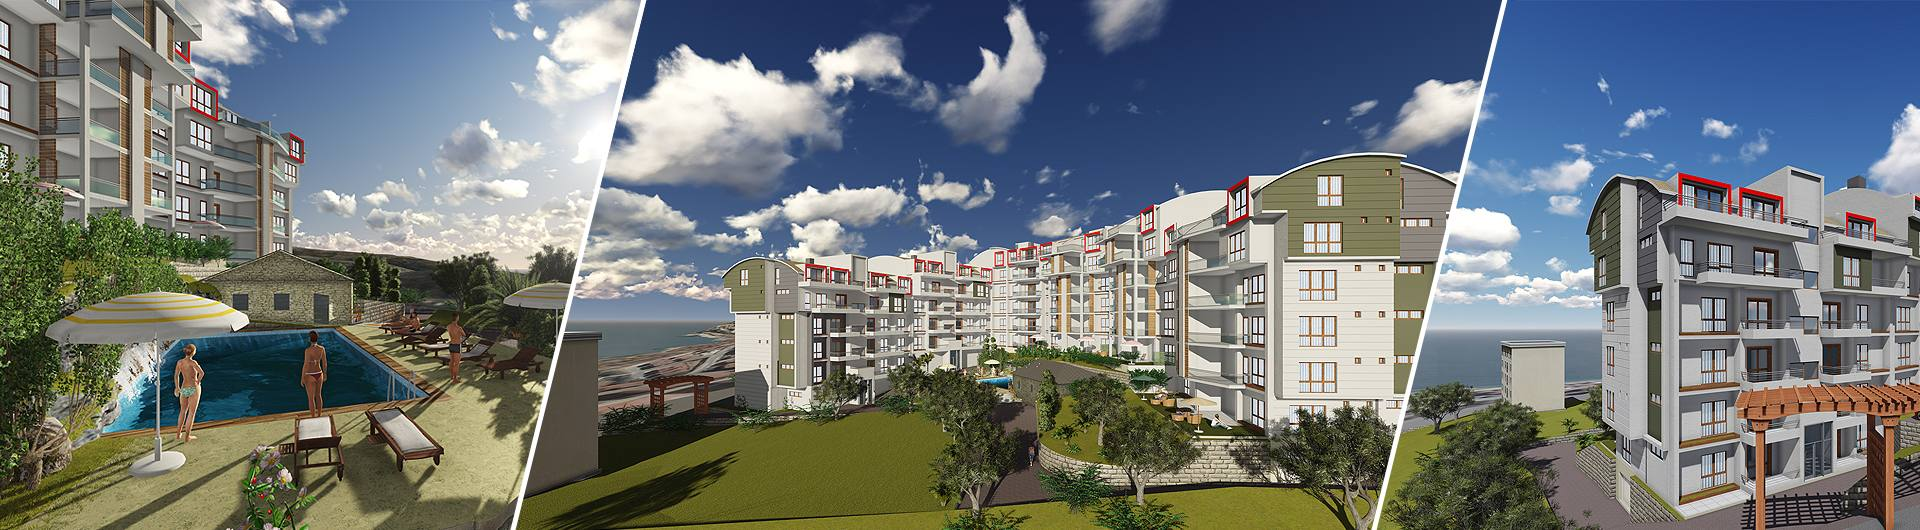 Buryap İnşaat Olivium Residence 2 Konut Projesi arkaplan